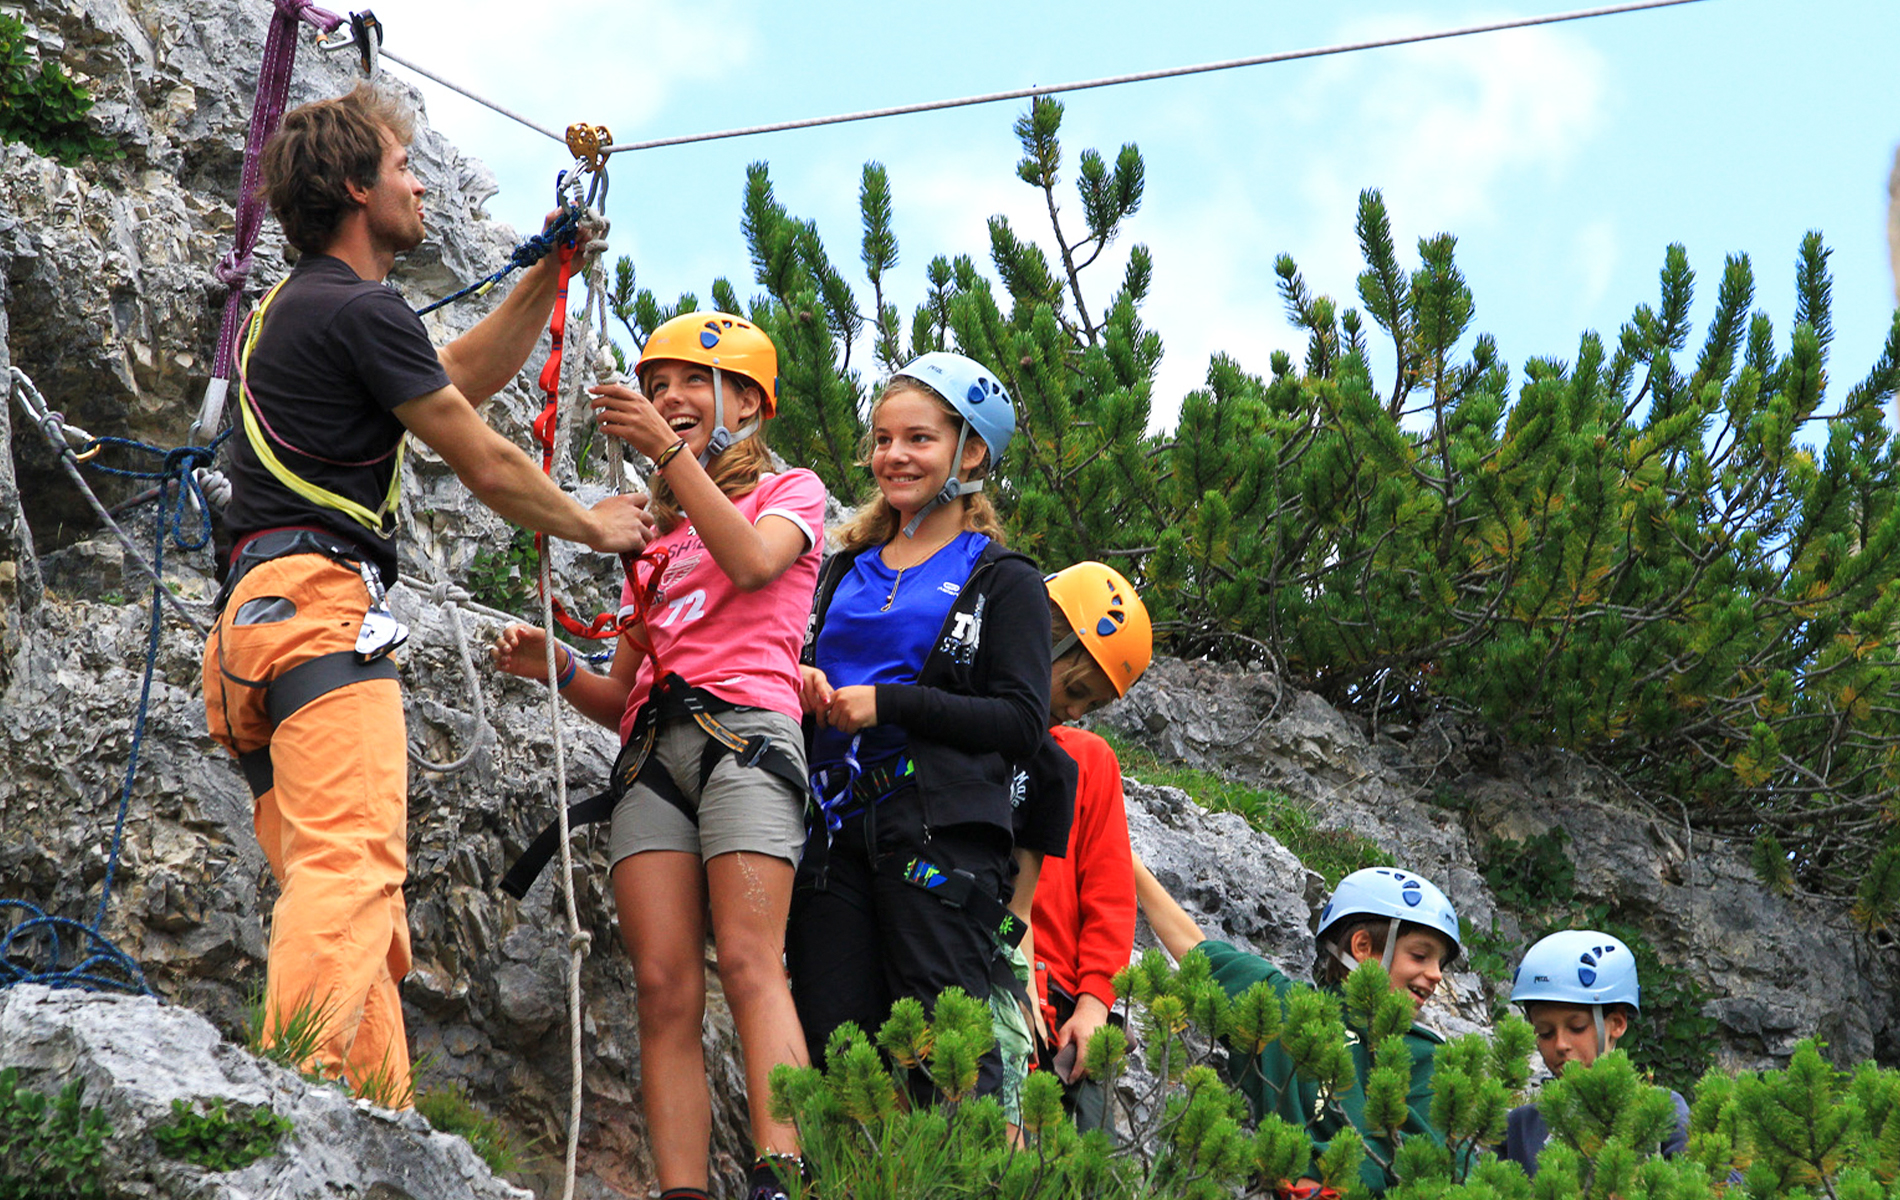 Vacanze famiglia in val di fassa a moena hotel alle alpi for Vacanze in famiglia